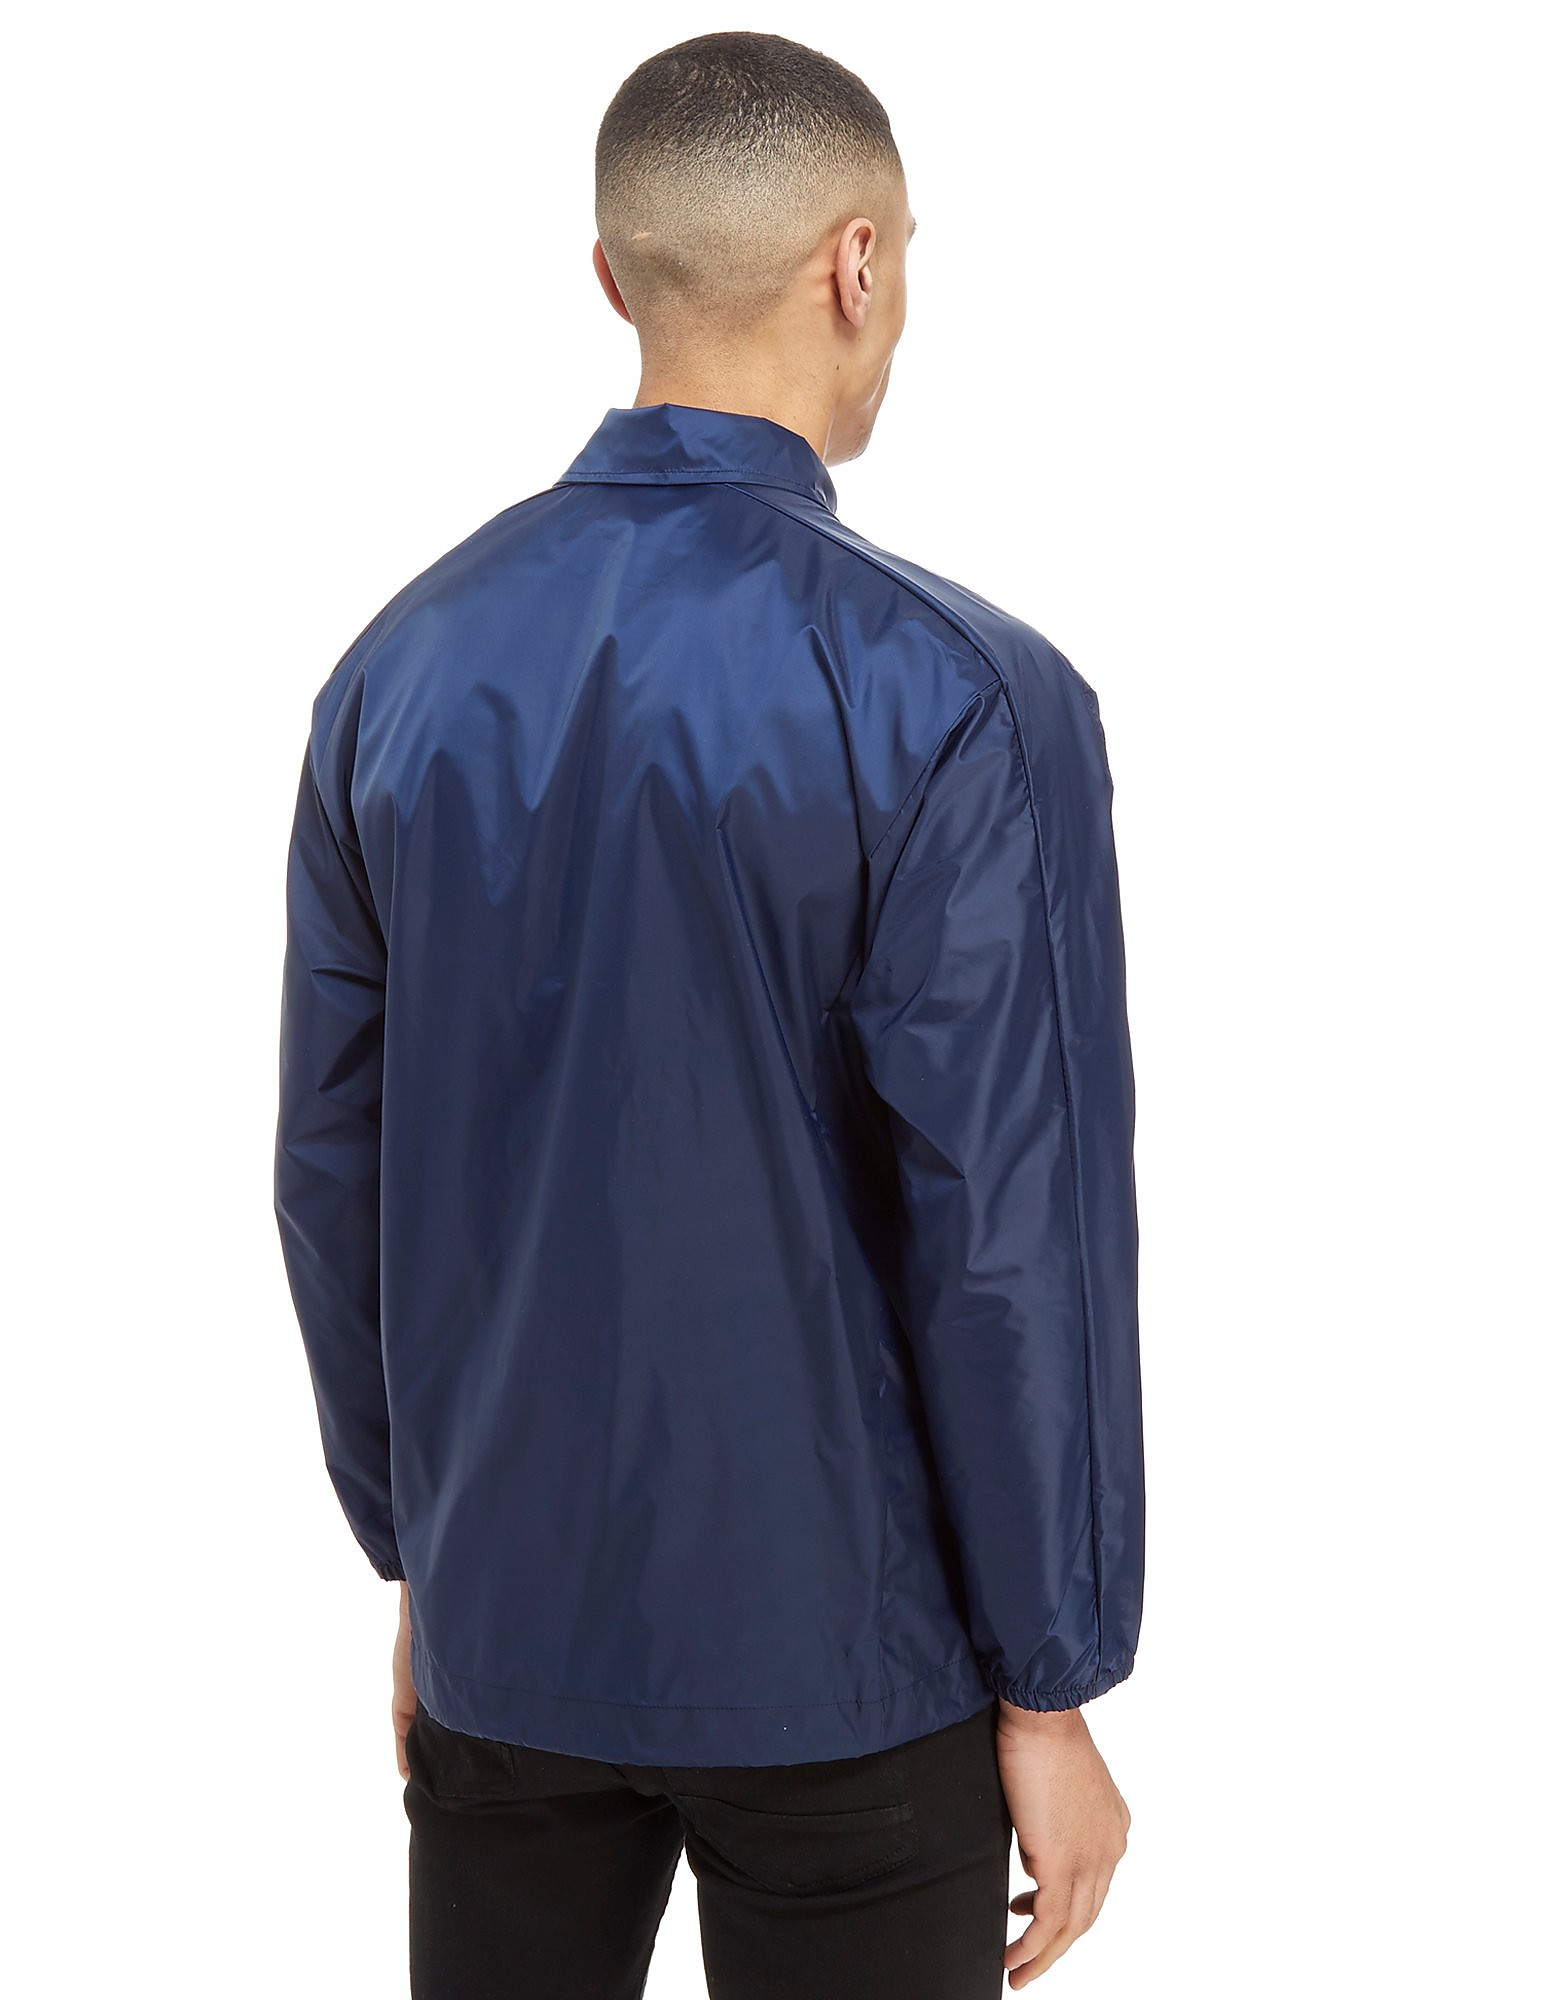 adidas Originals Trefoil Coach Jacket